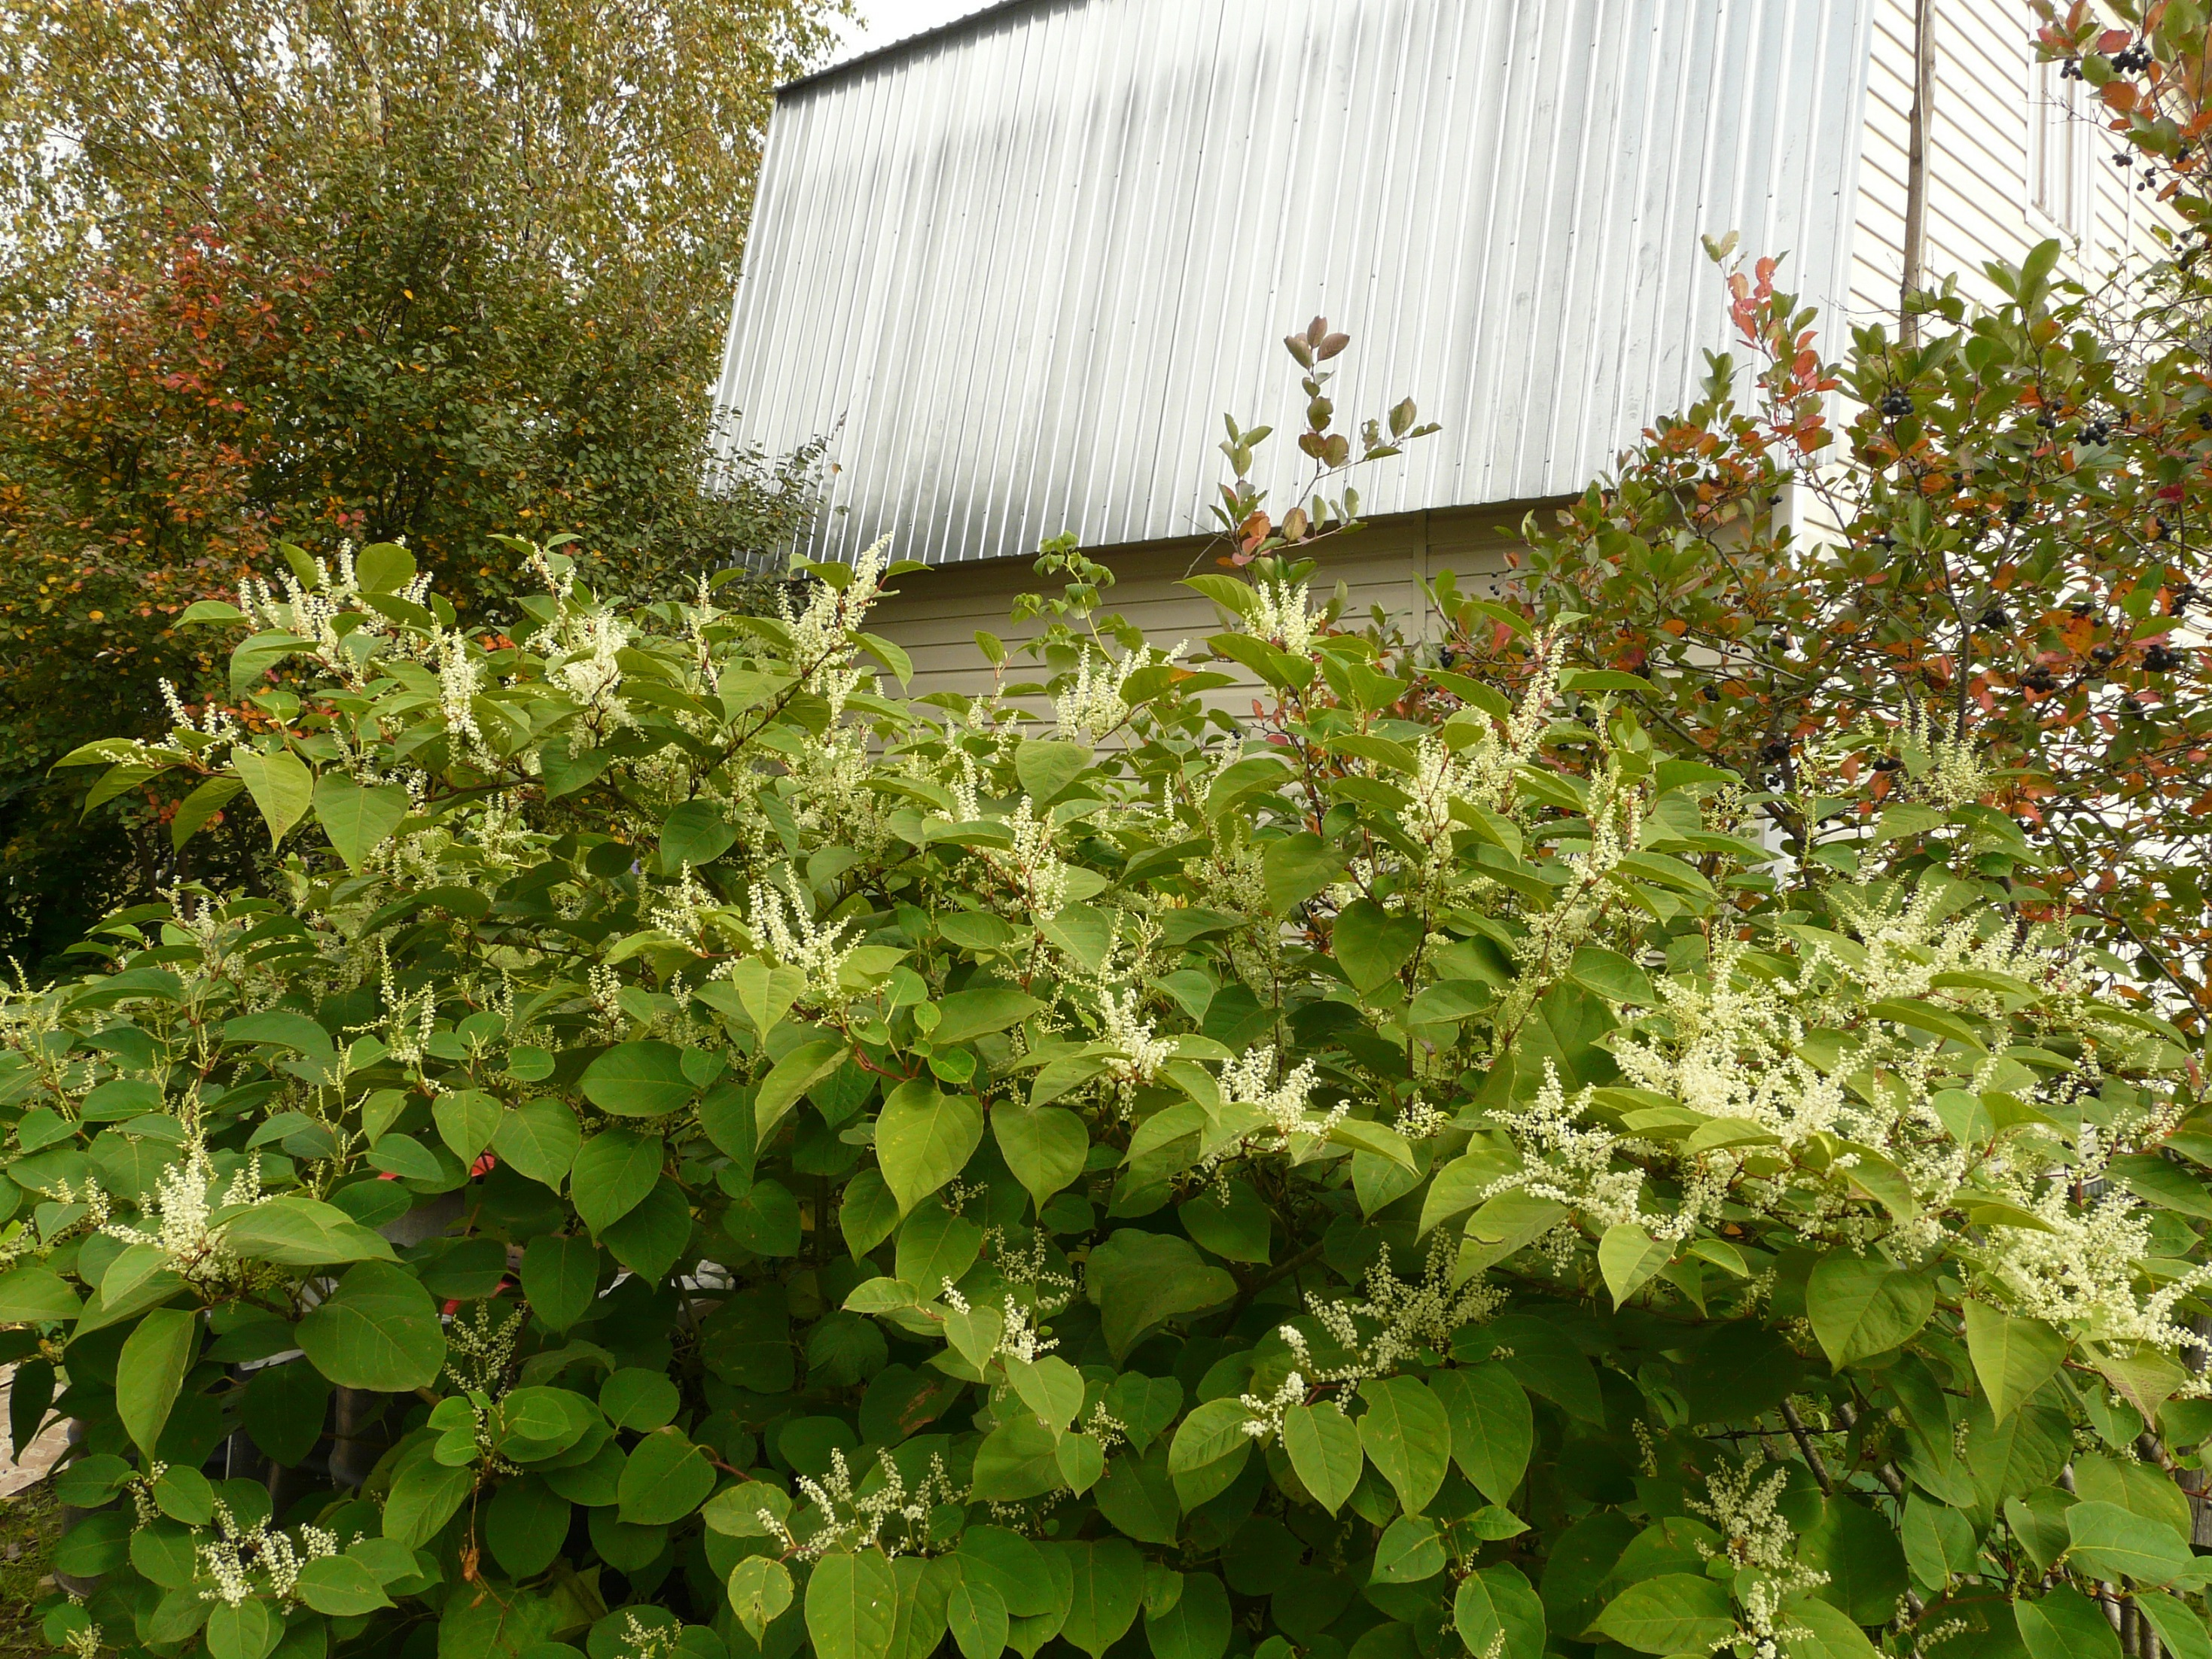 время горец сахалинский или гречиха сахалинская фото щучья икра мелкая